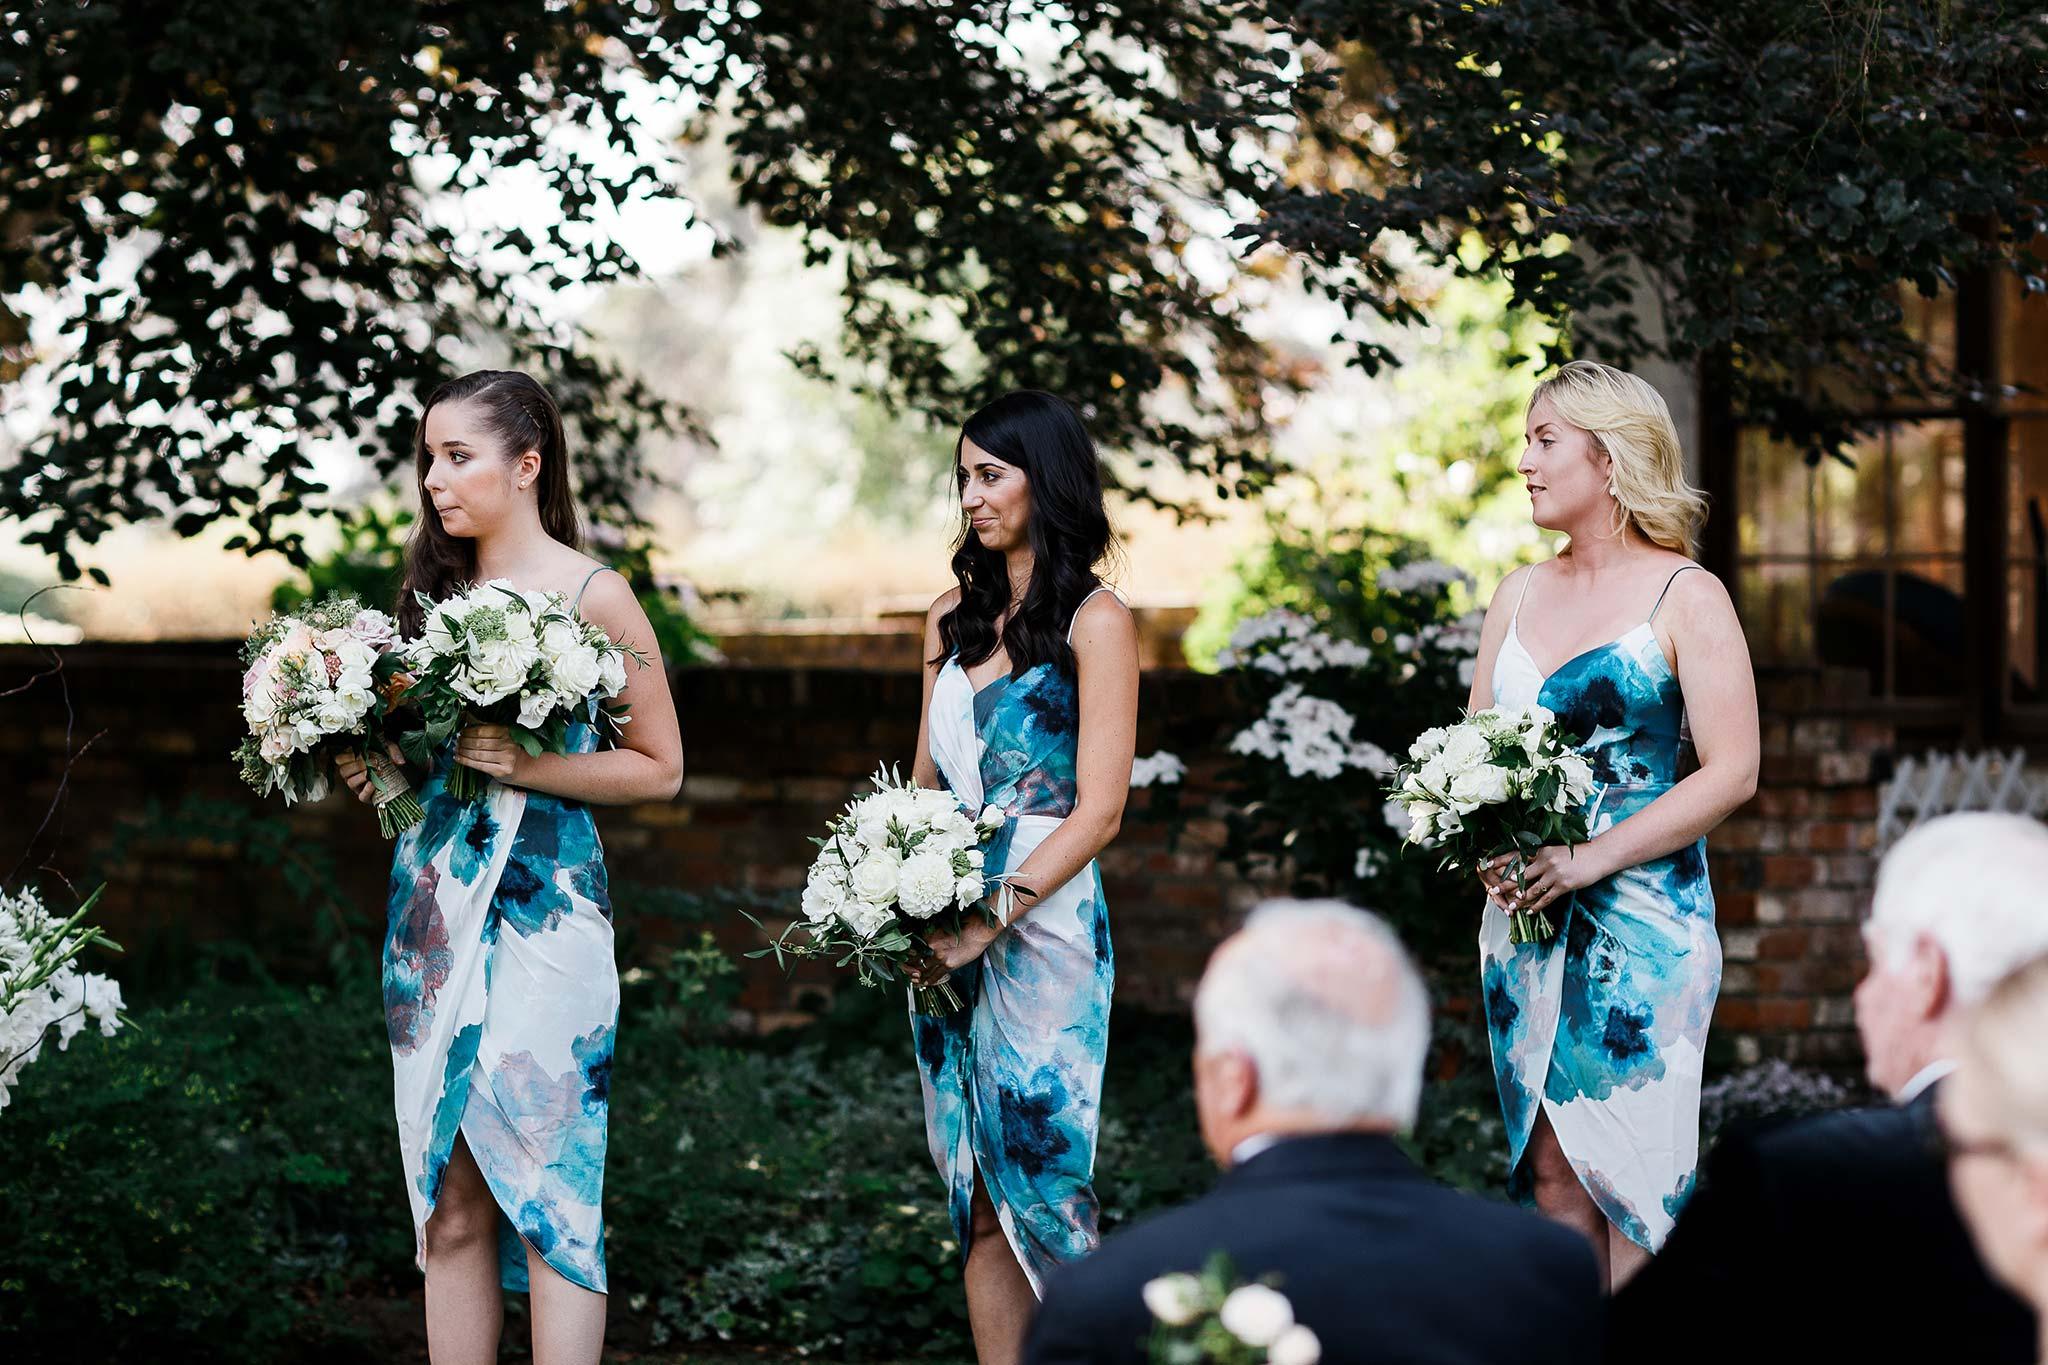 Launceston-Brickendon-barn-Wedding-Photographer-ceremony-bridesmaids